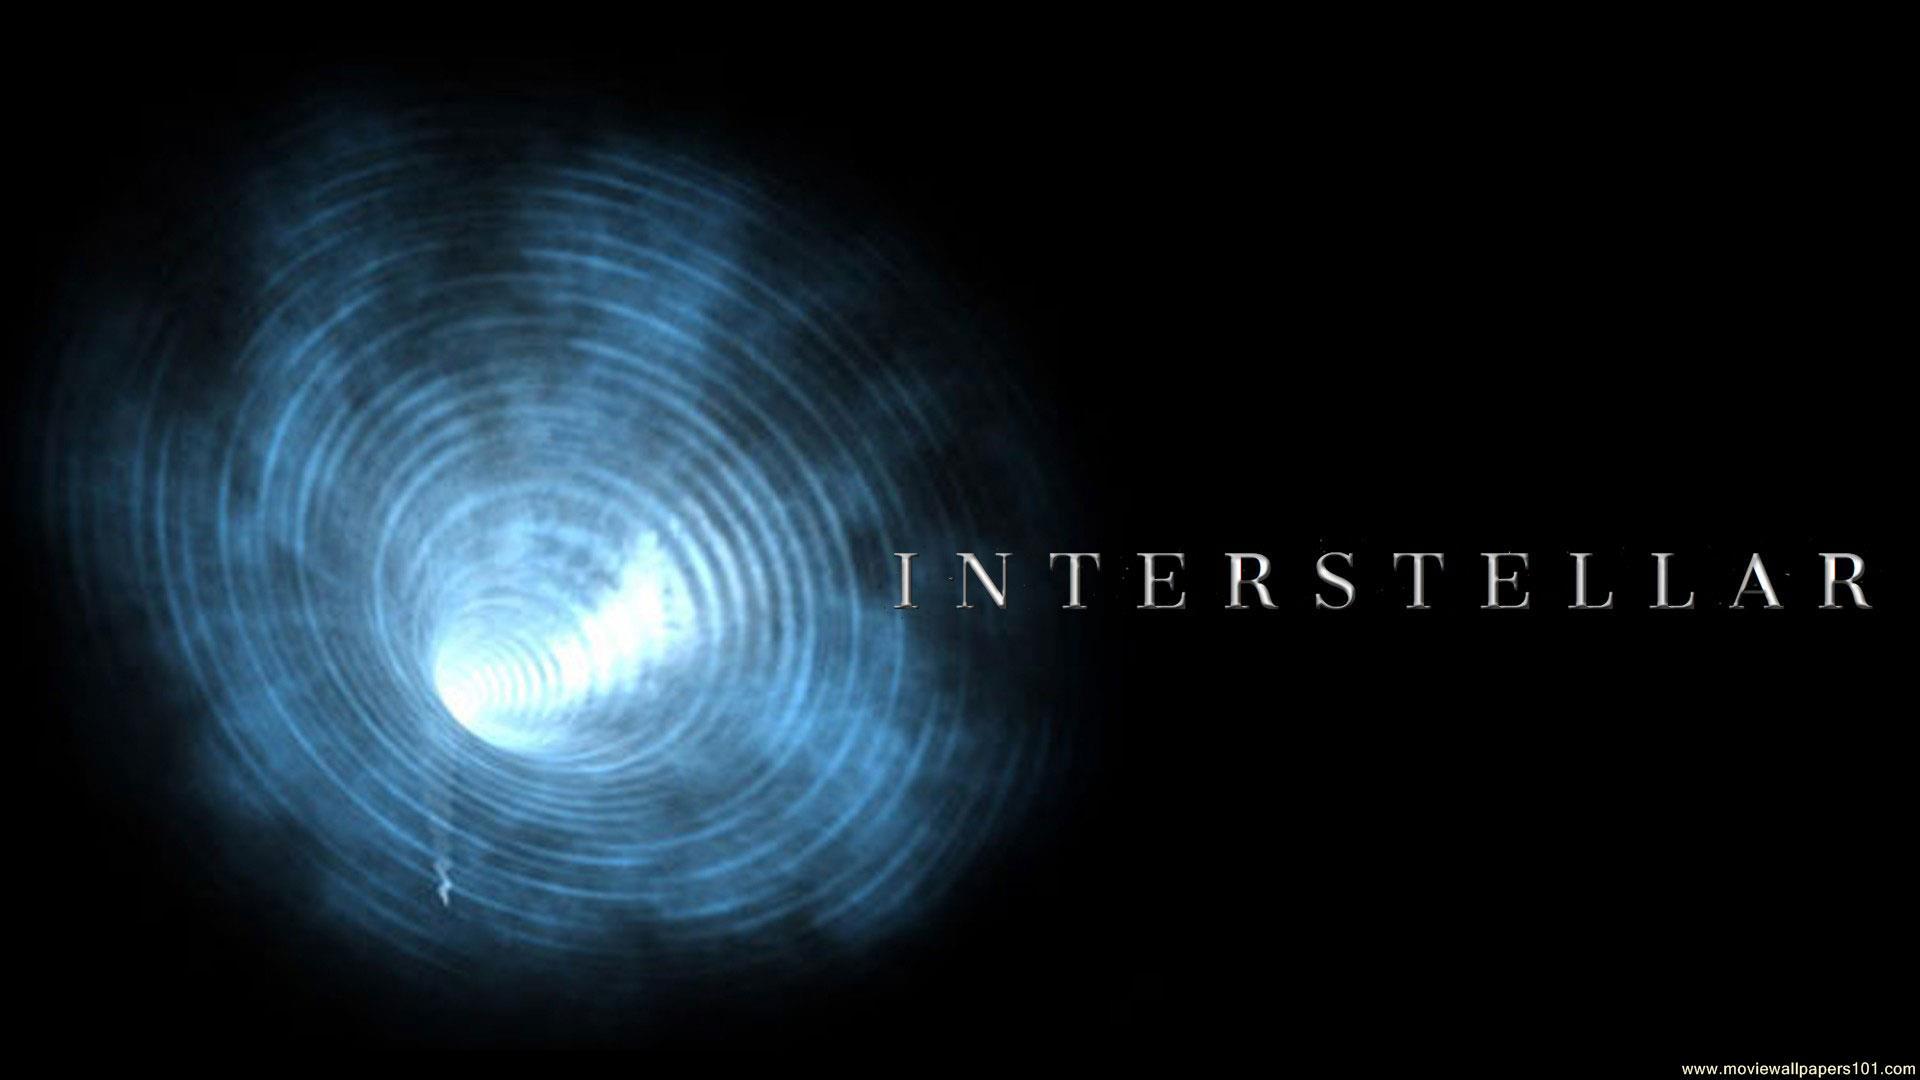 Interstellar wallpaper   1920x1080 MovieWallpapers101com 1920x1080